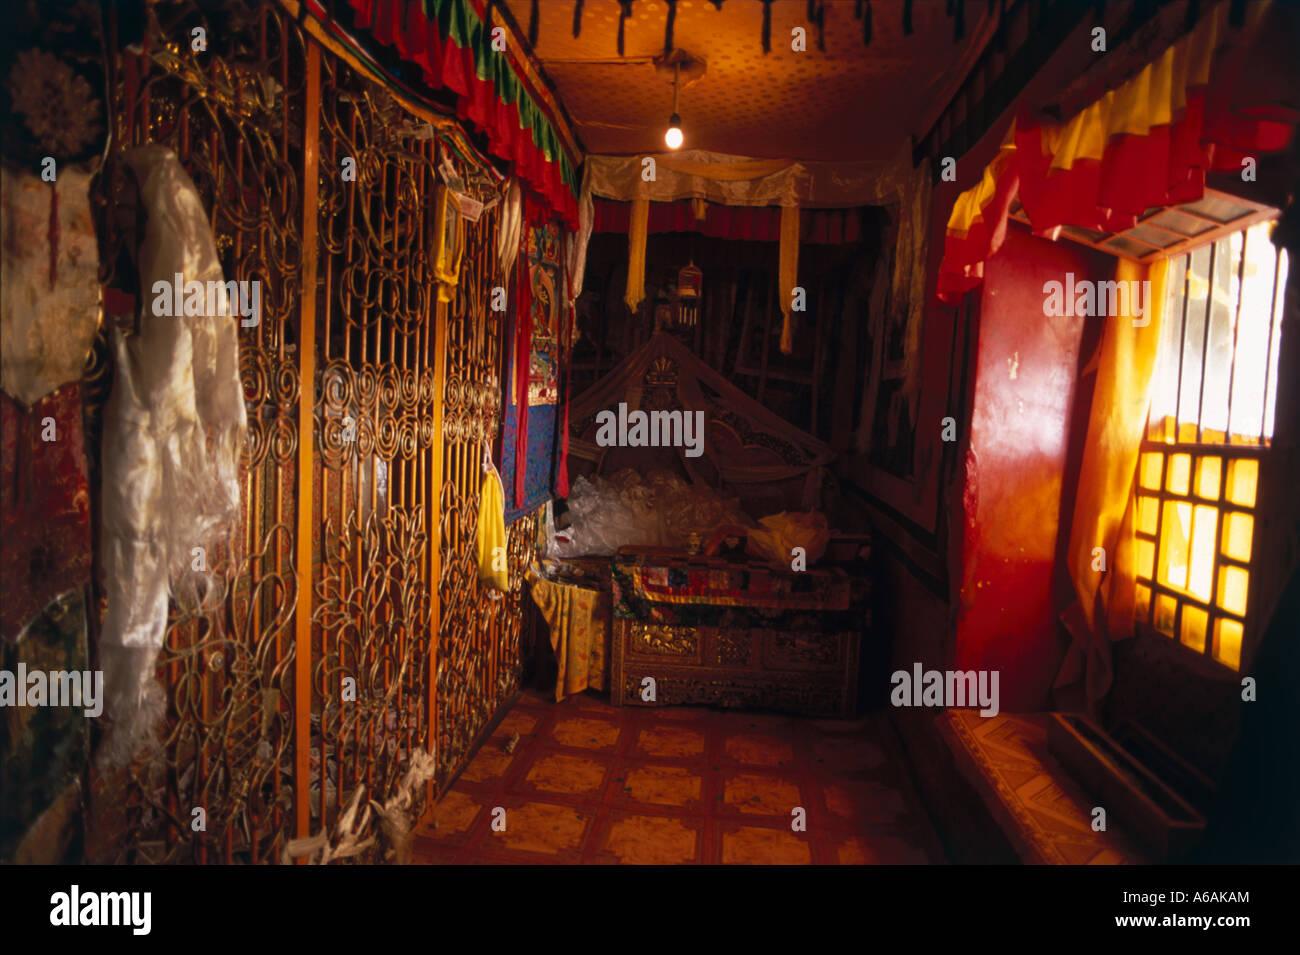 China, Tibet, Samye Monastery, Quarters of Dalai Lama, interior of simple apartment - Stock Image